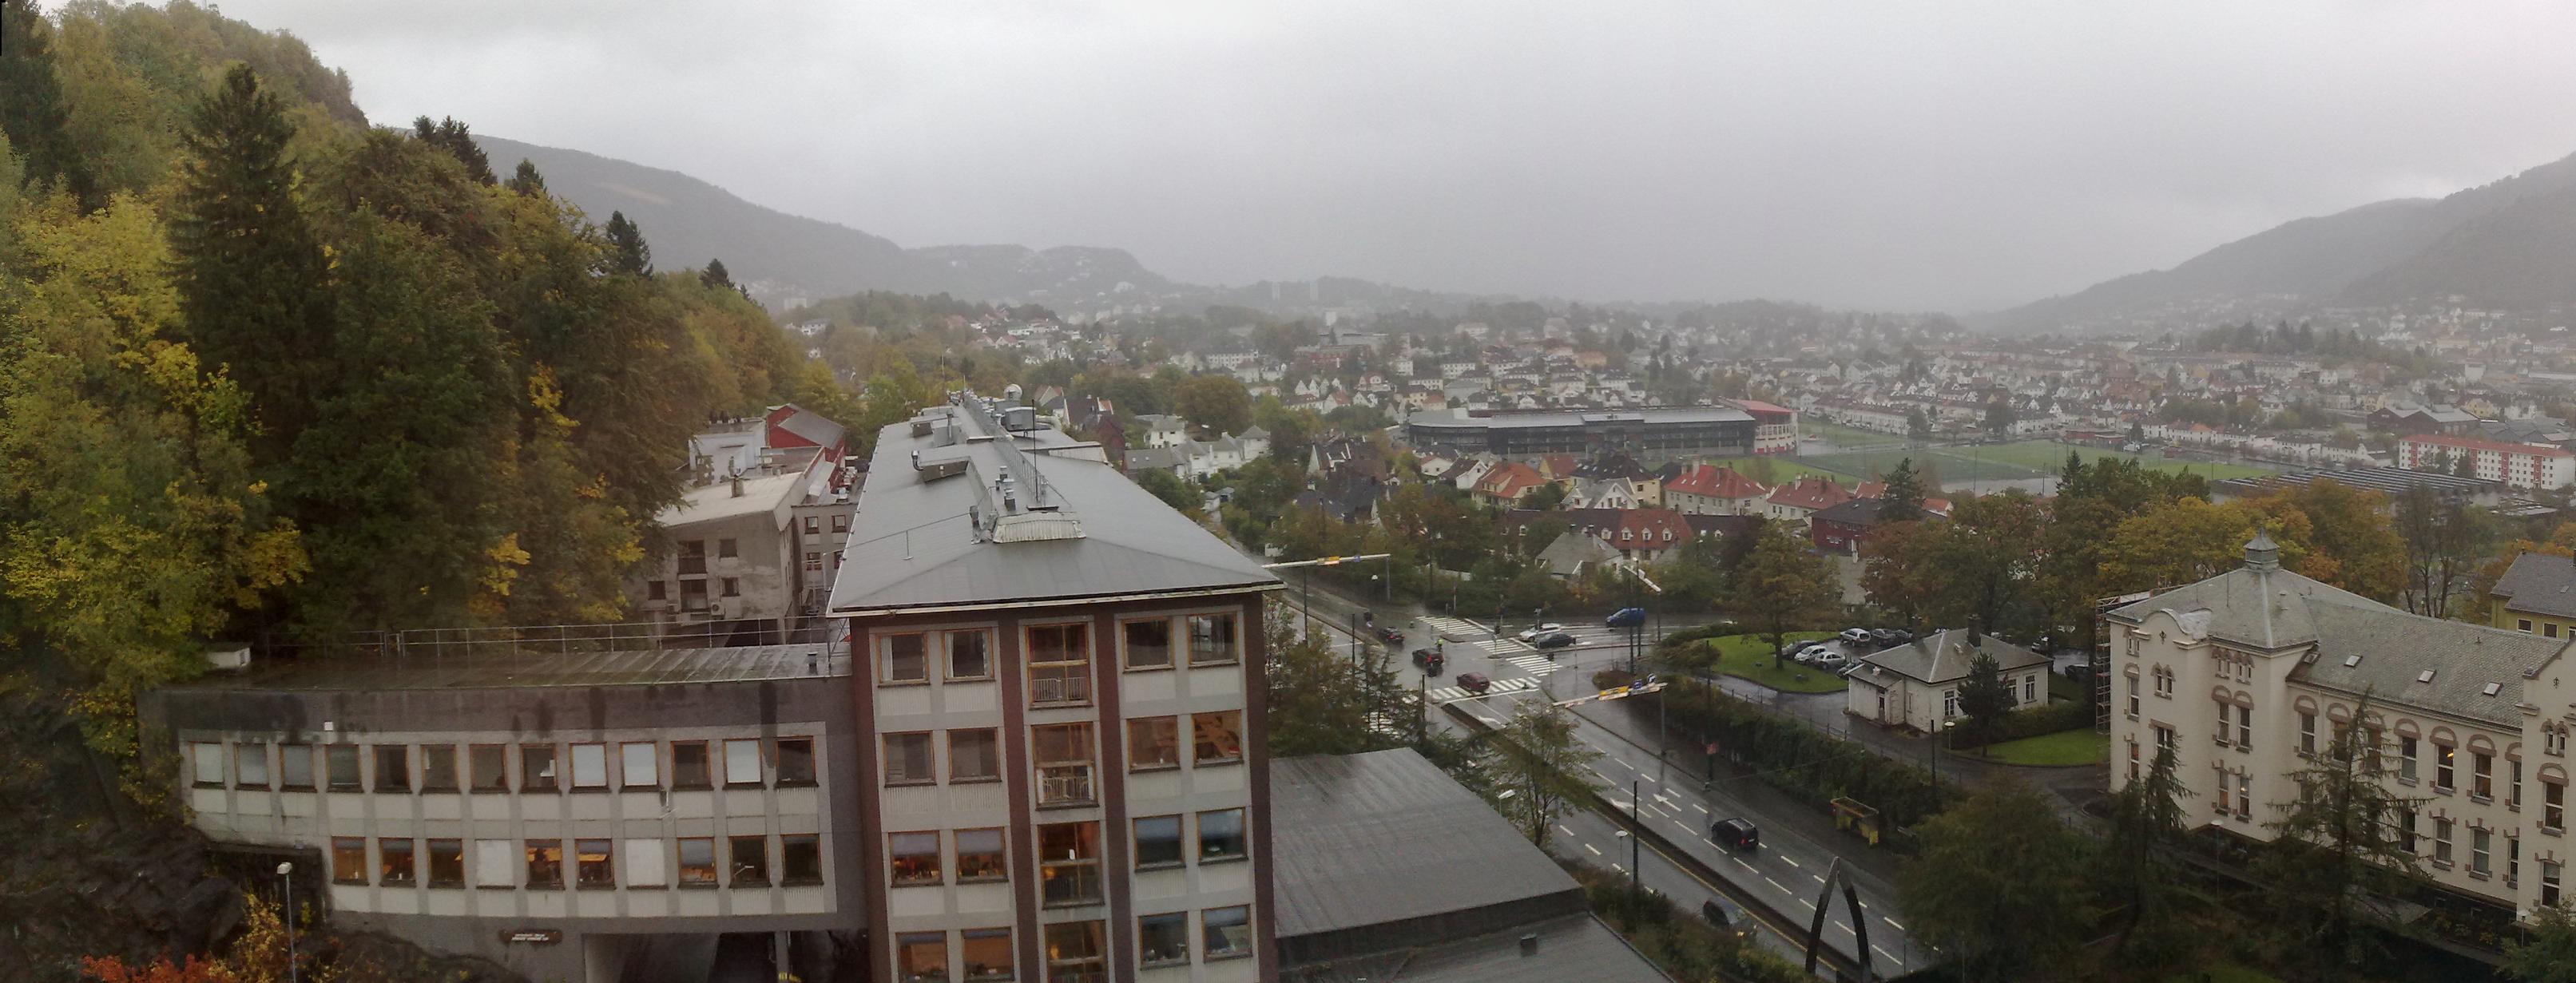 Haukeland, Bergen